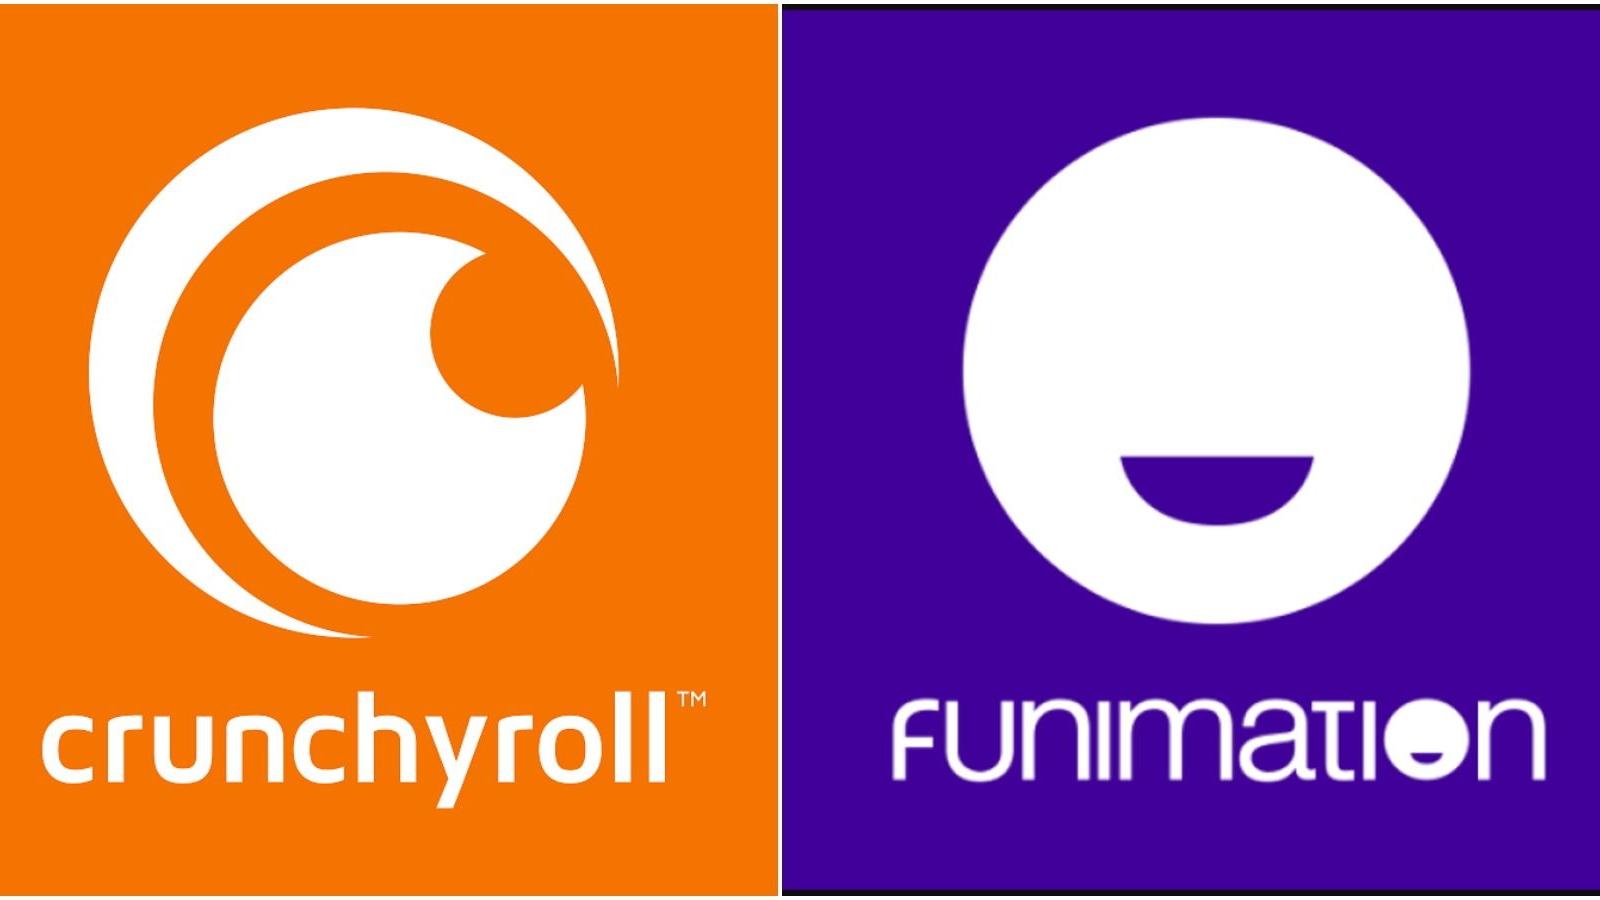 Sony acquista Crunchyroll: ecco cosa potrebbe succedere